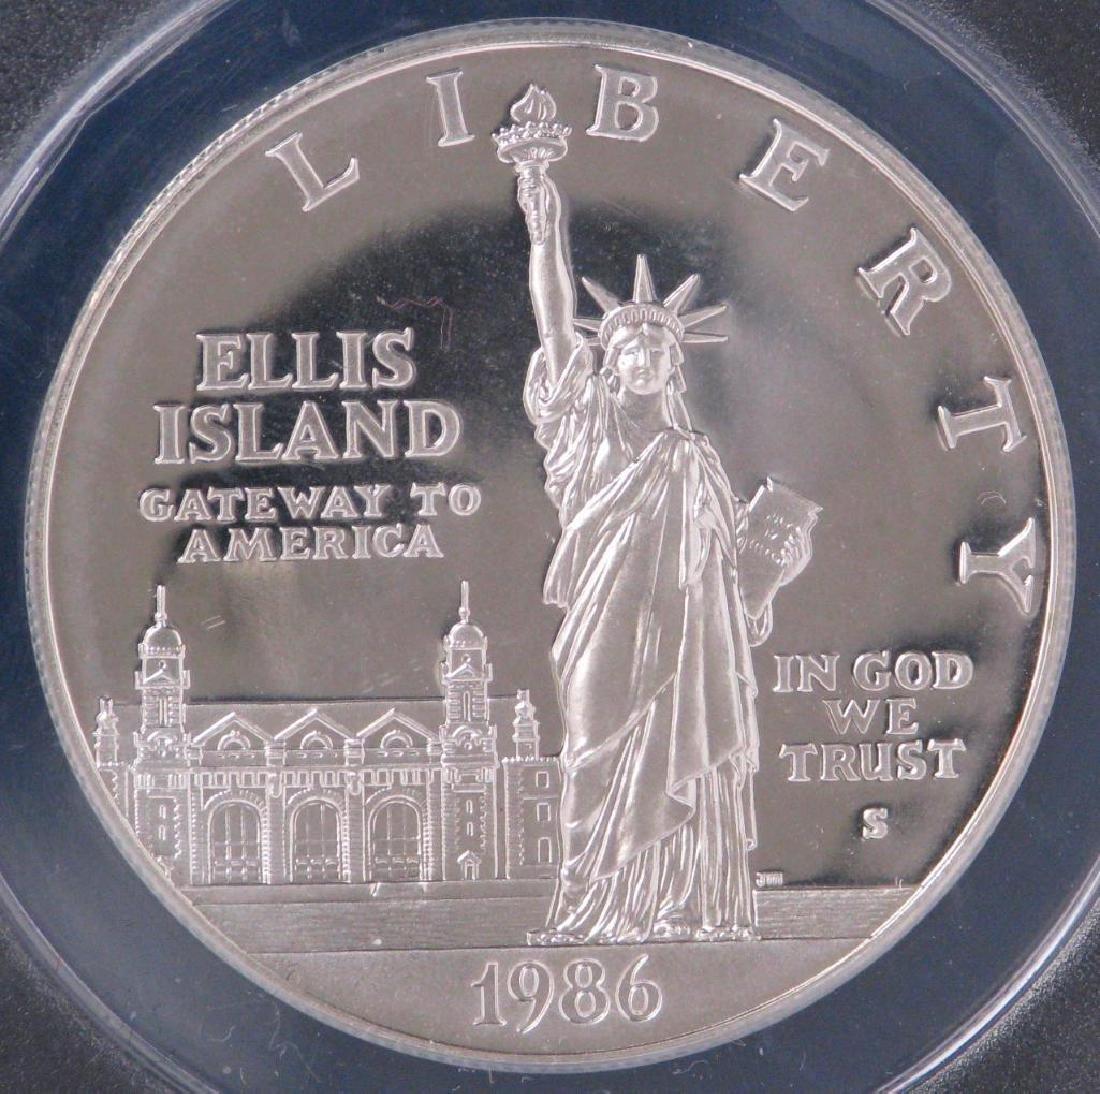 1986-S Statue of Liberty Centennial Commemorative Coin - 3